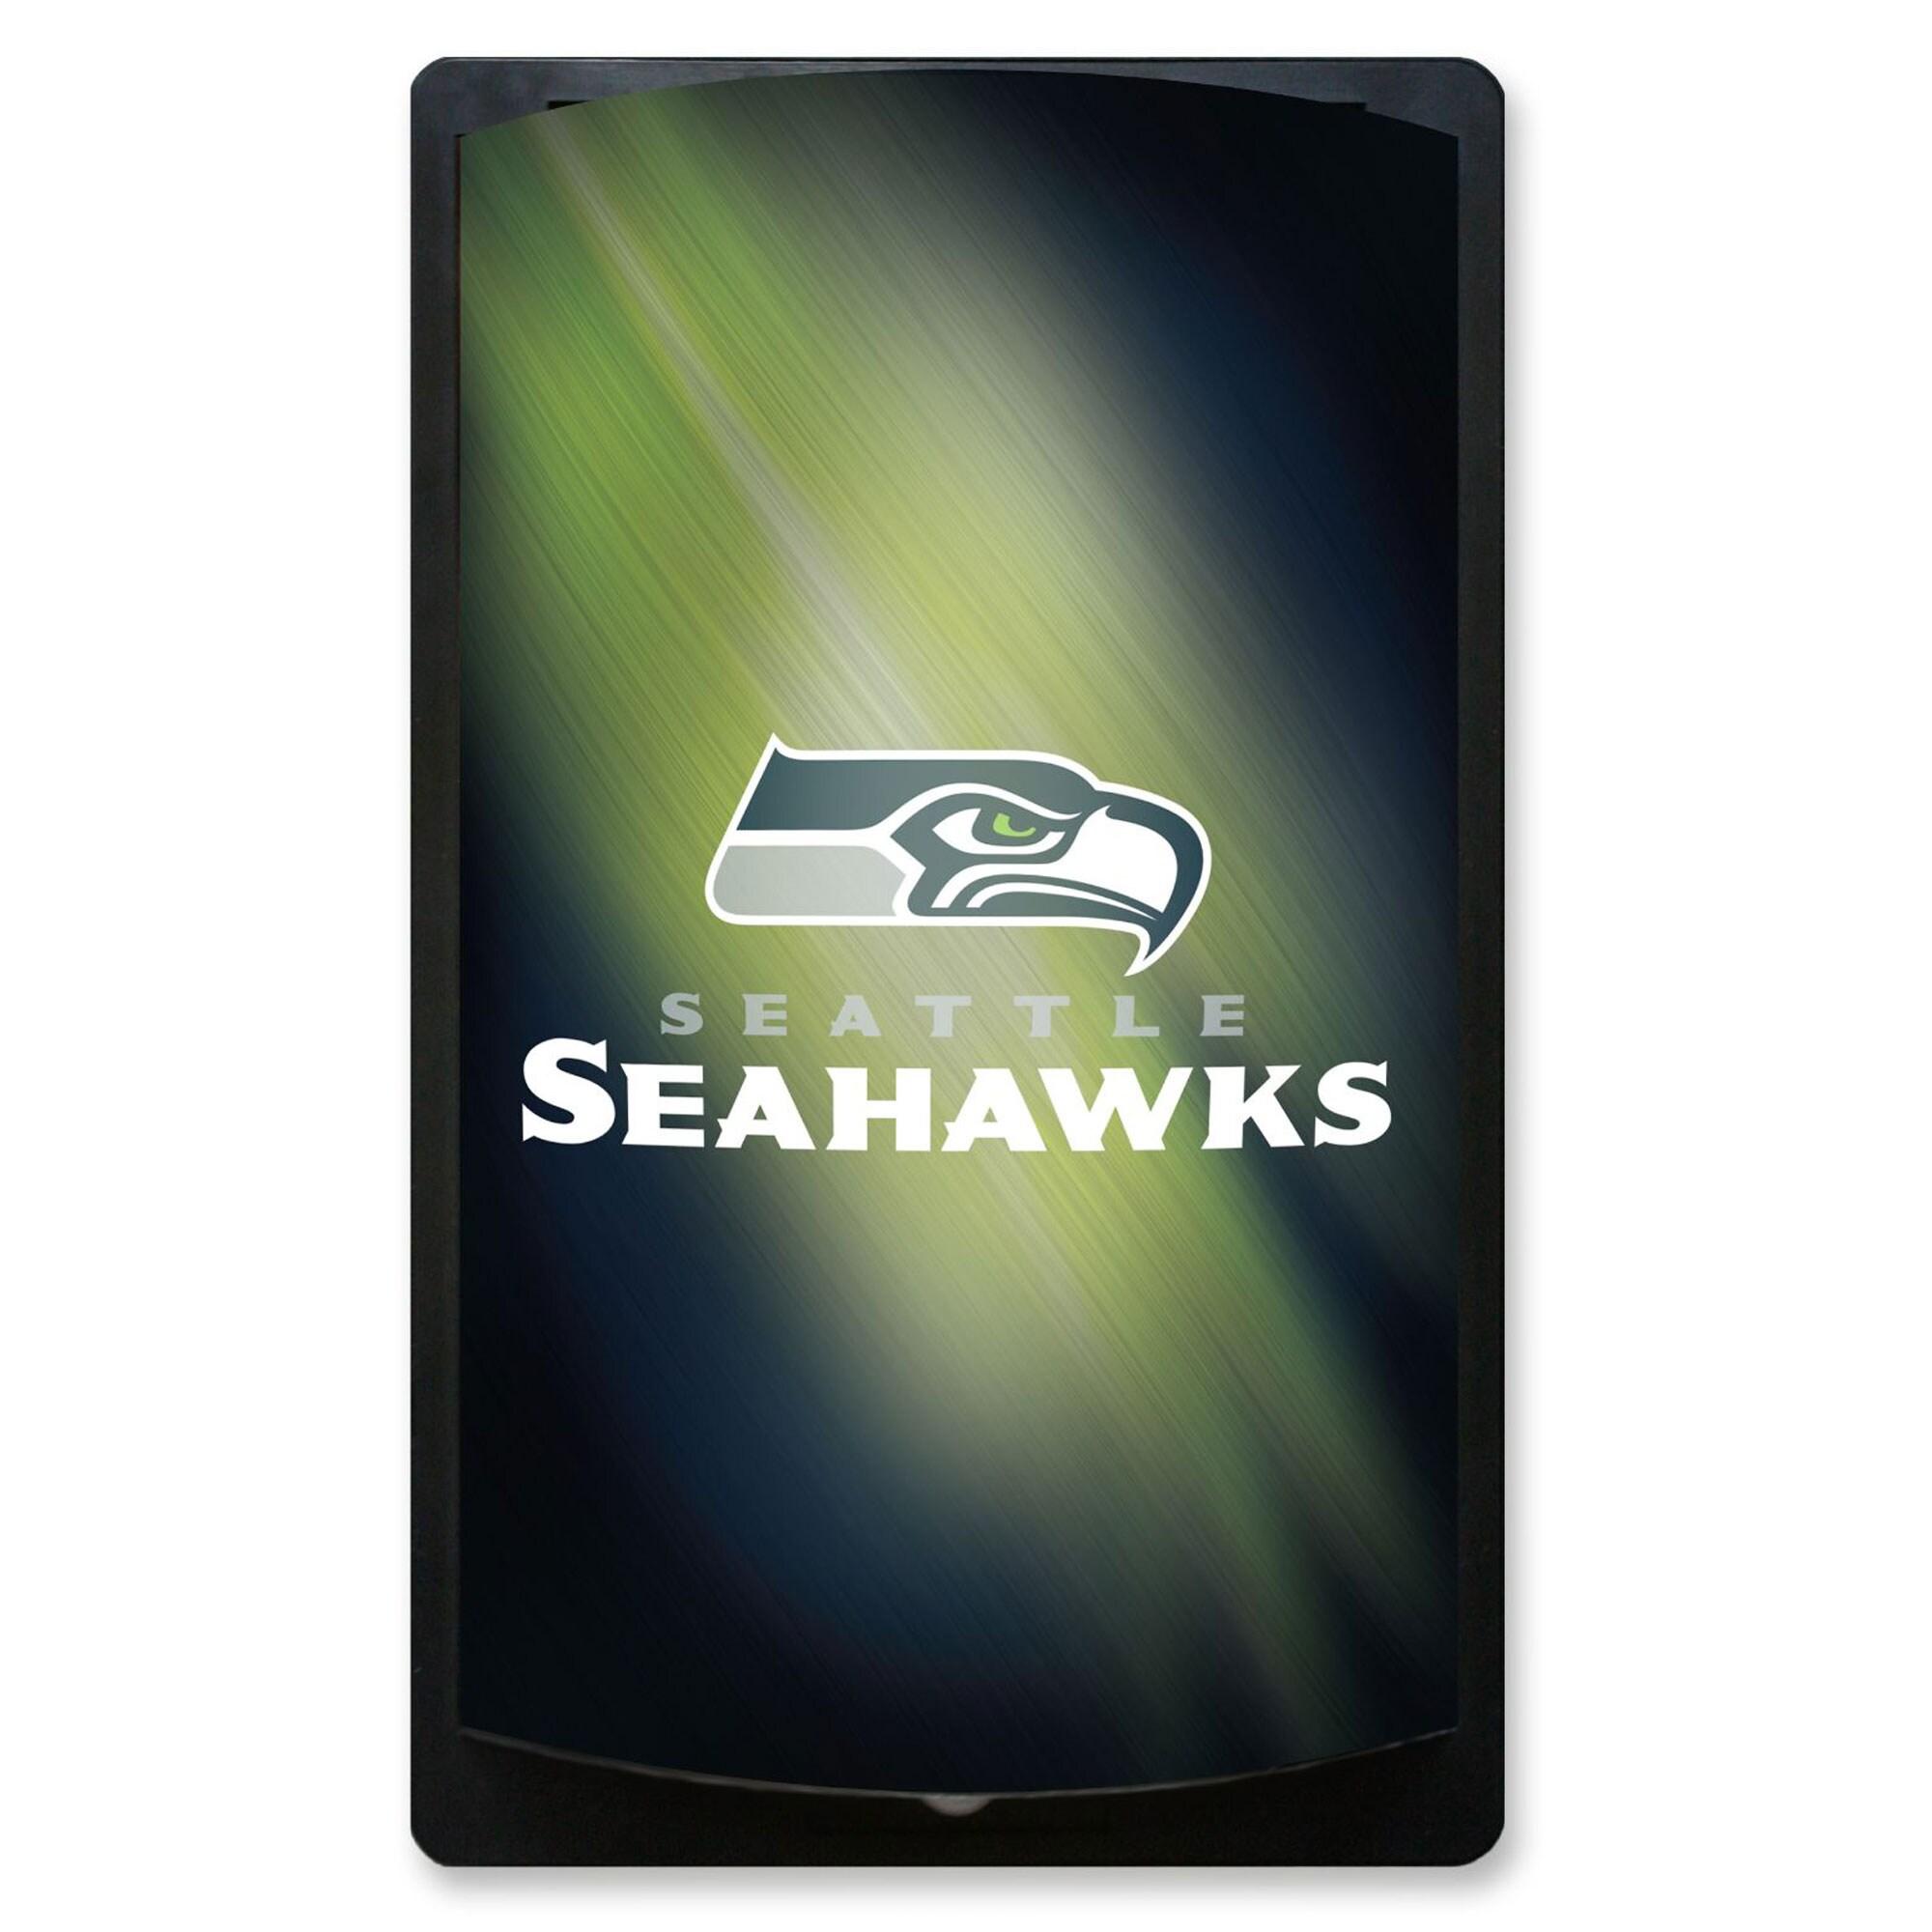 Seattle Seahawks 12.5'' x 7.5'' MotiGlow Sign